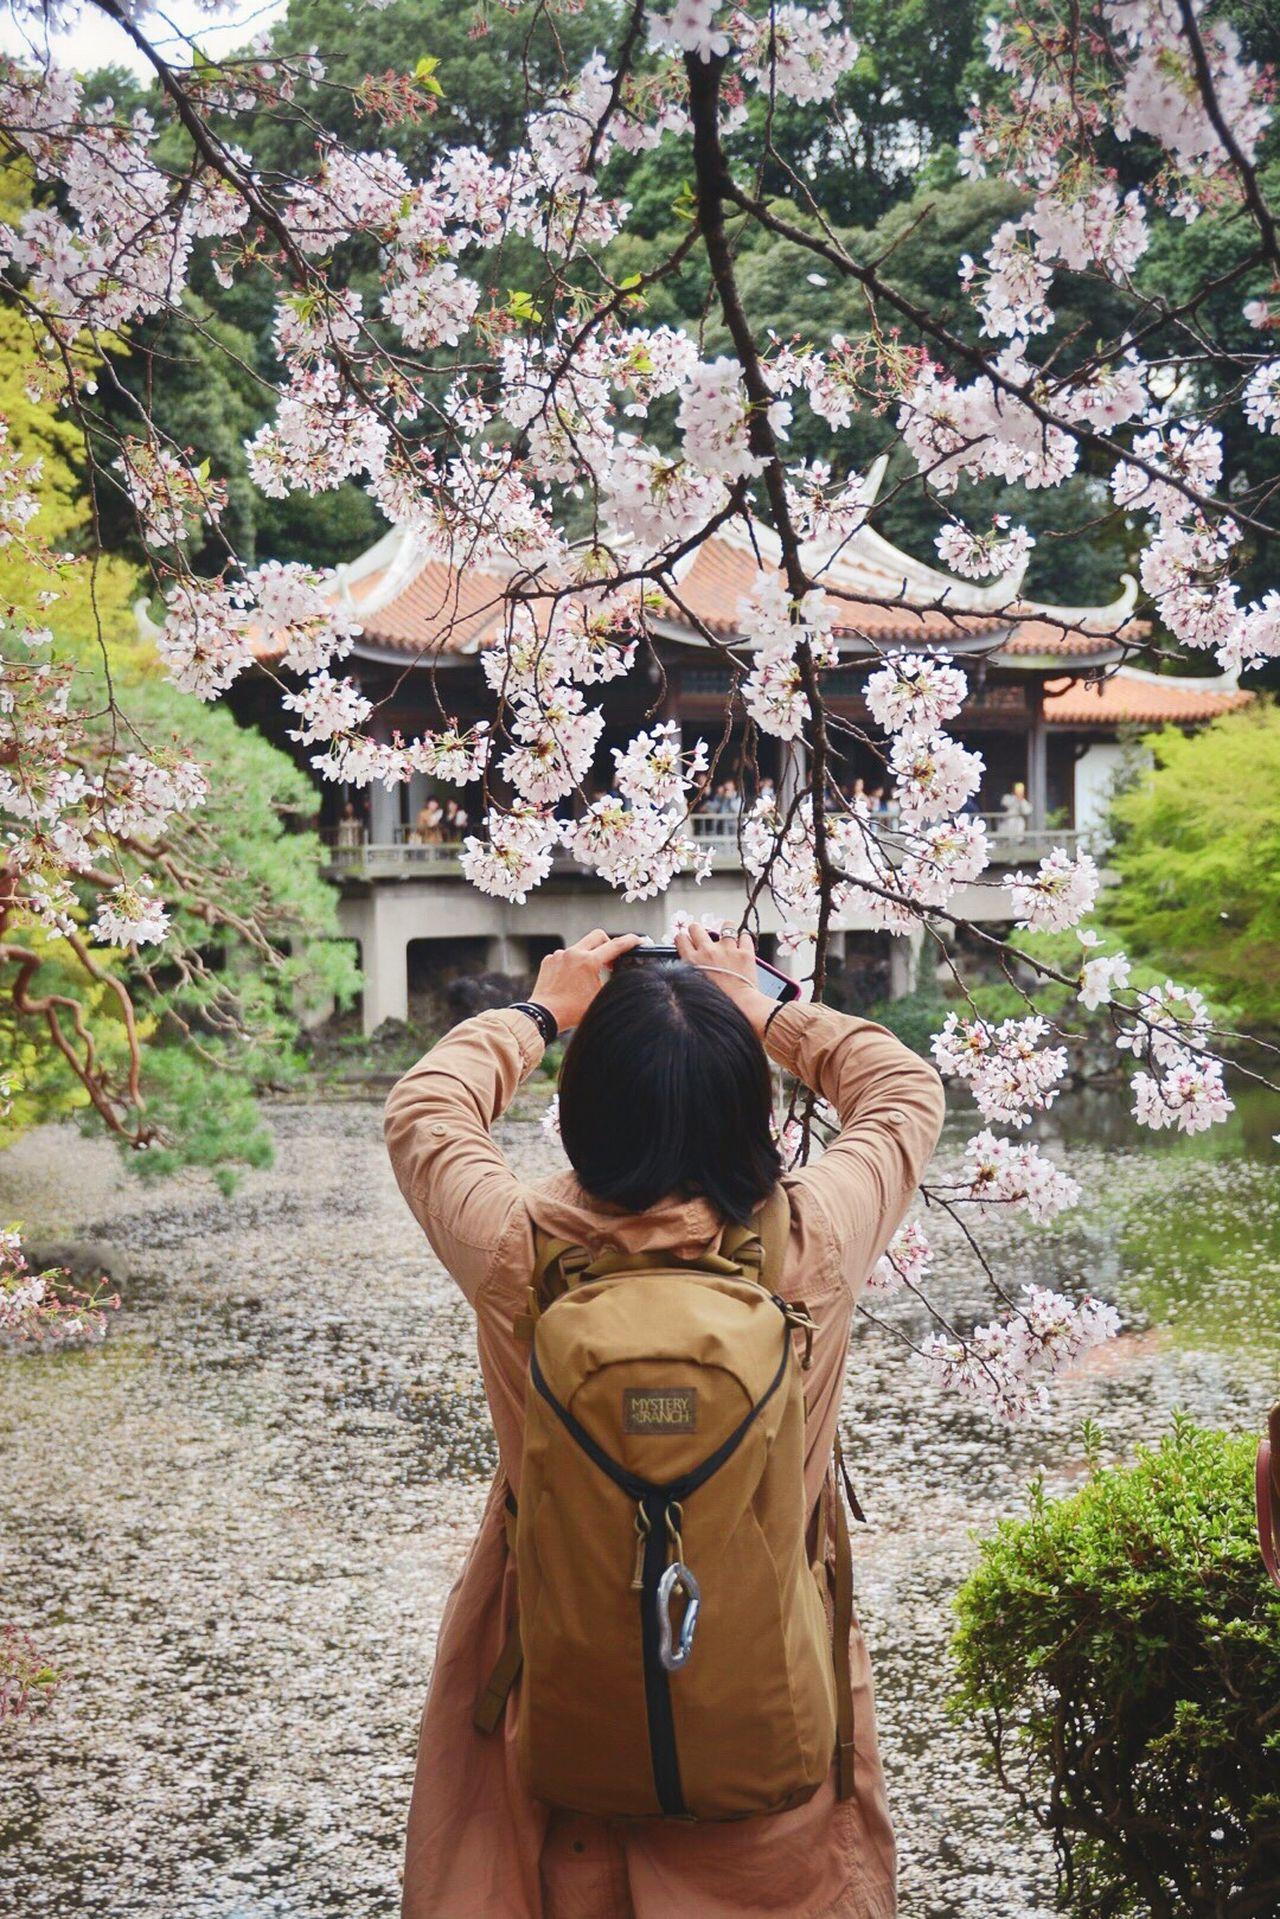 EyeEm Tokyo Meetup 8 People EyeEm Nature Lover EyeEm Best Shots Secret Garden Urban Spring Fever